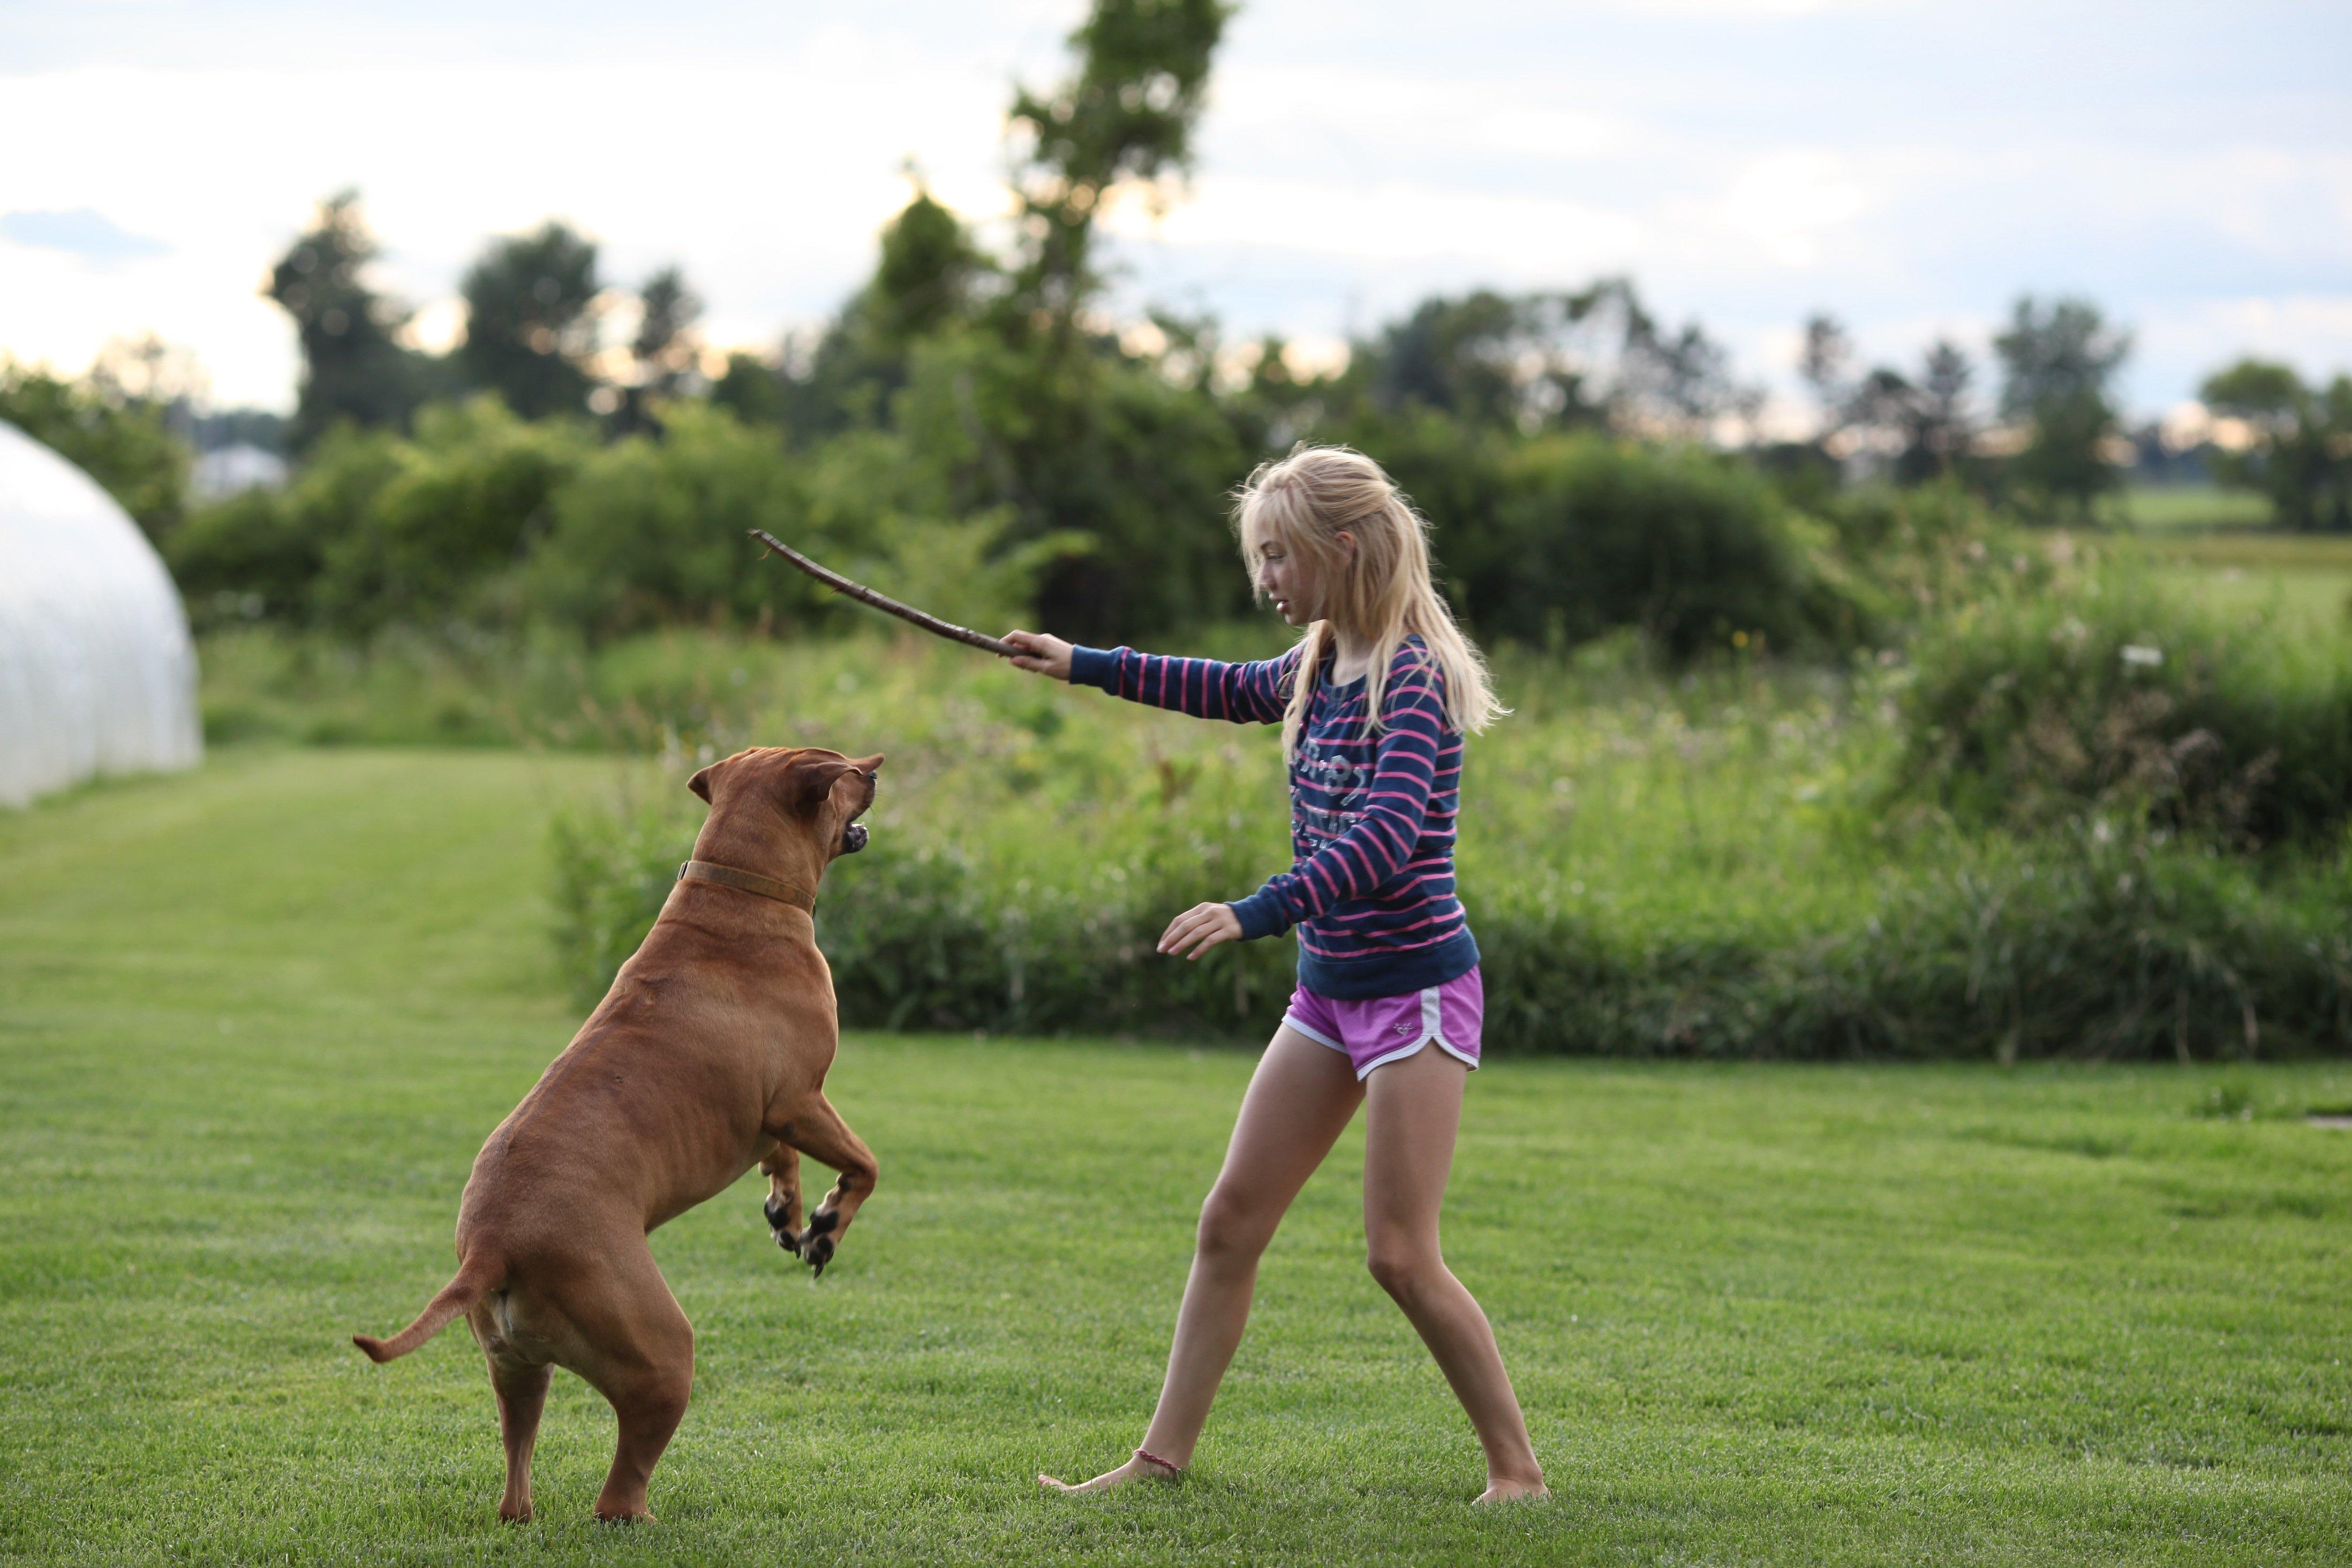 the magic flying dog #4